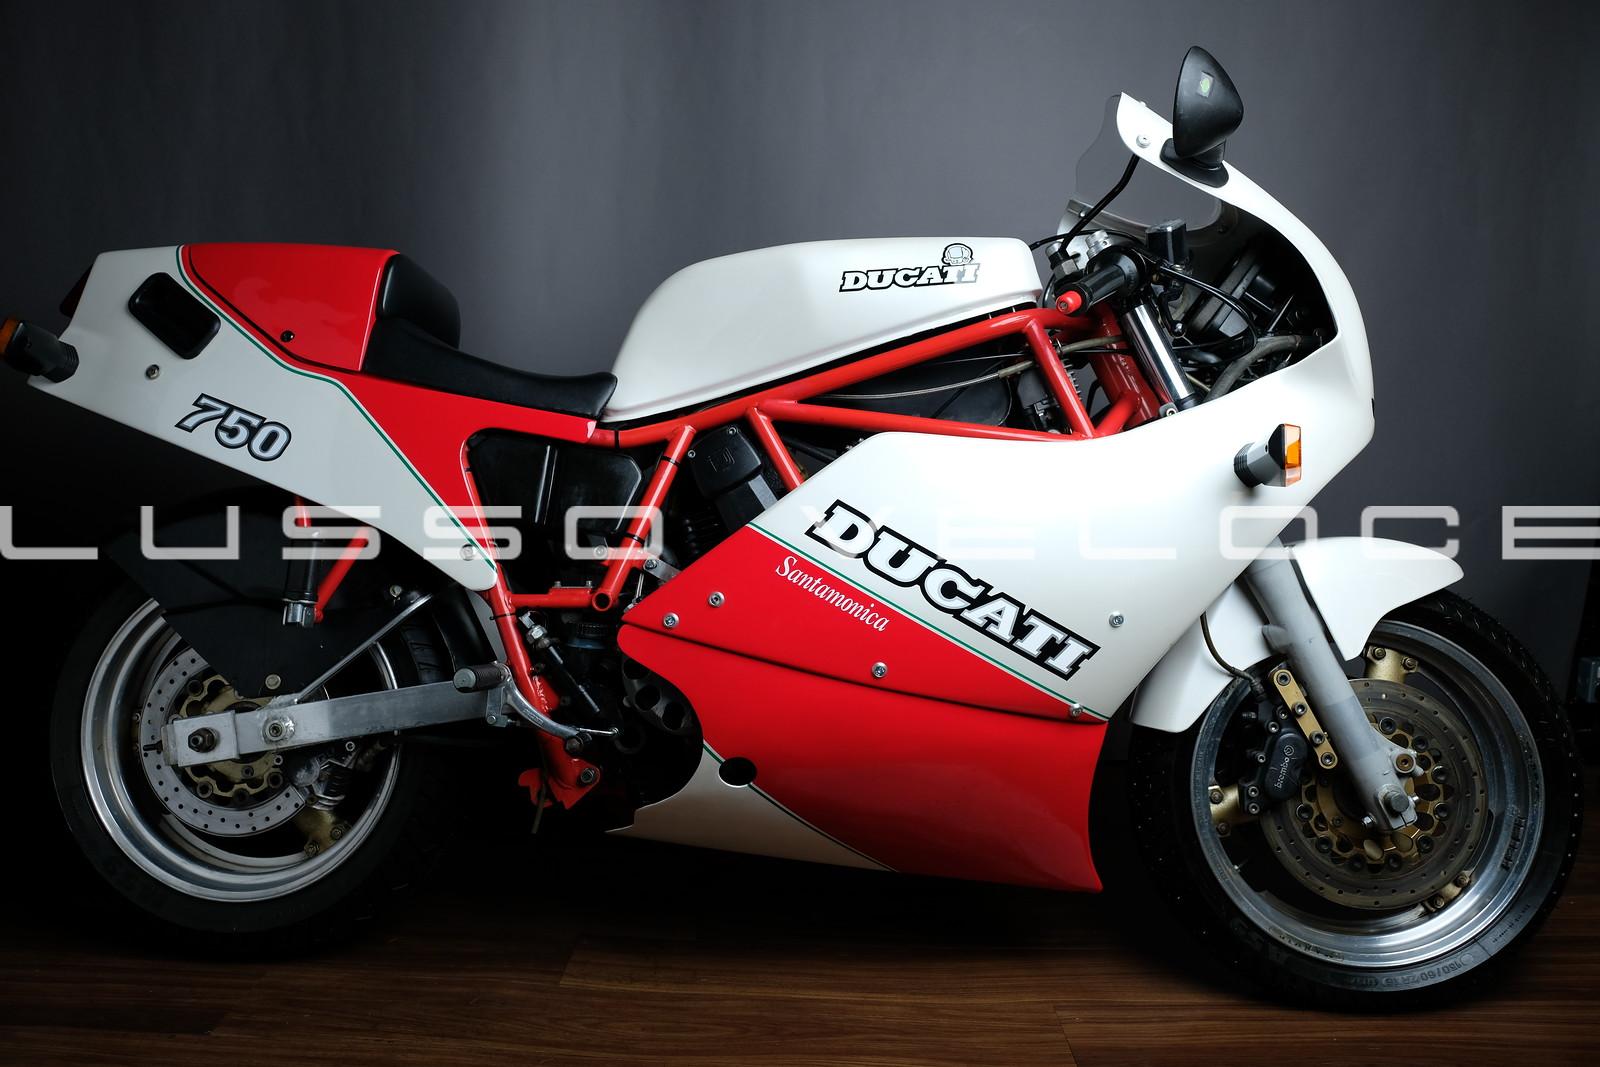 Ducati 750 F1 Santamonica